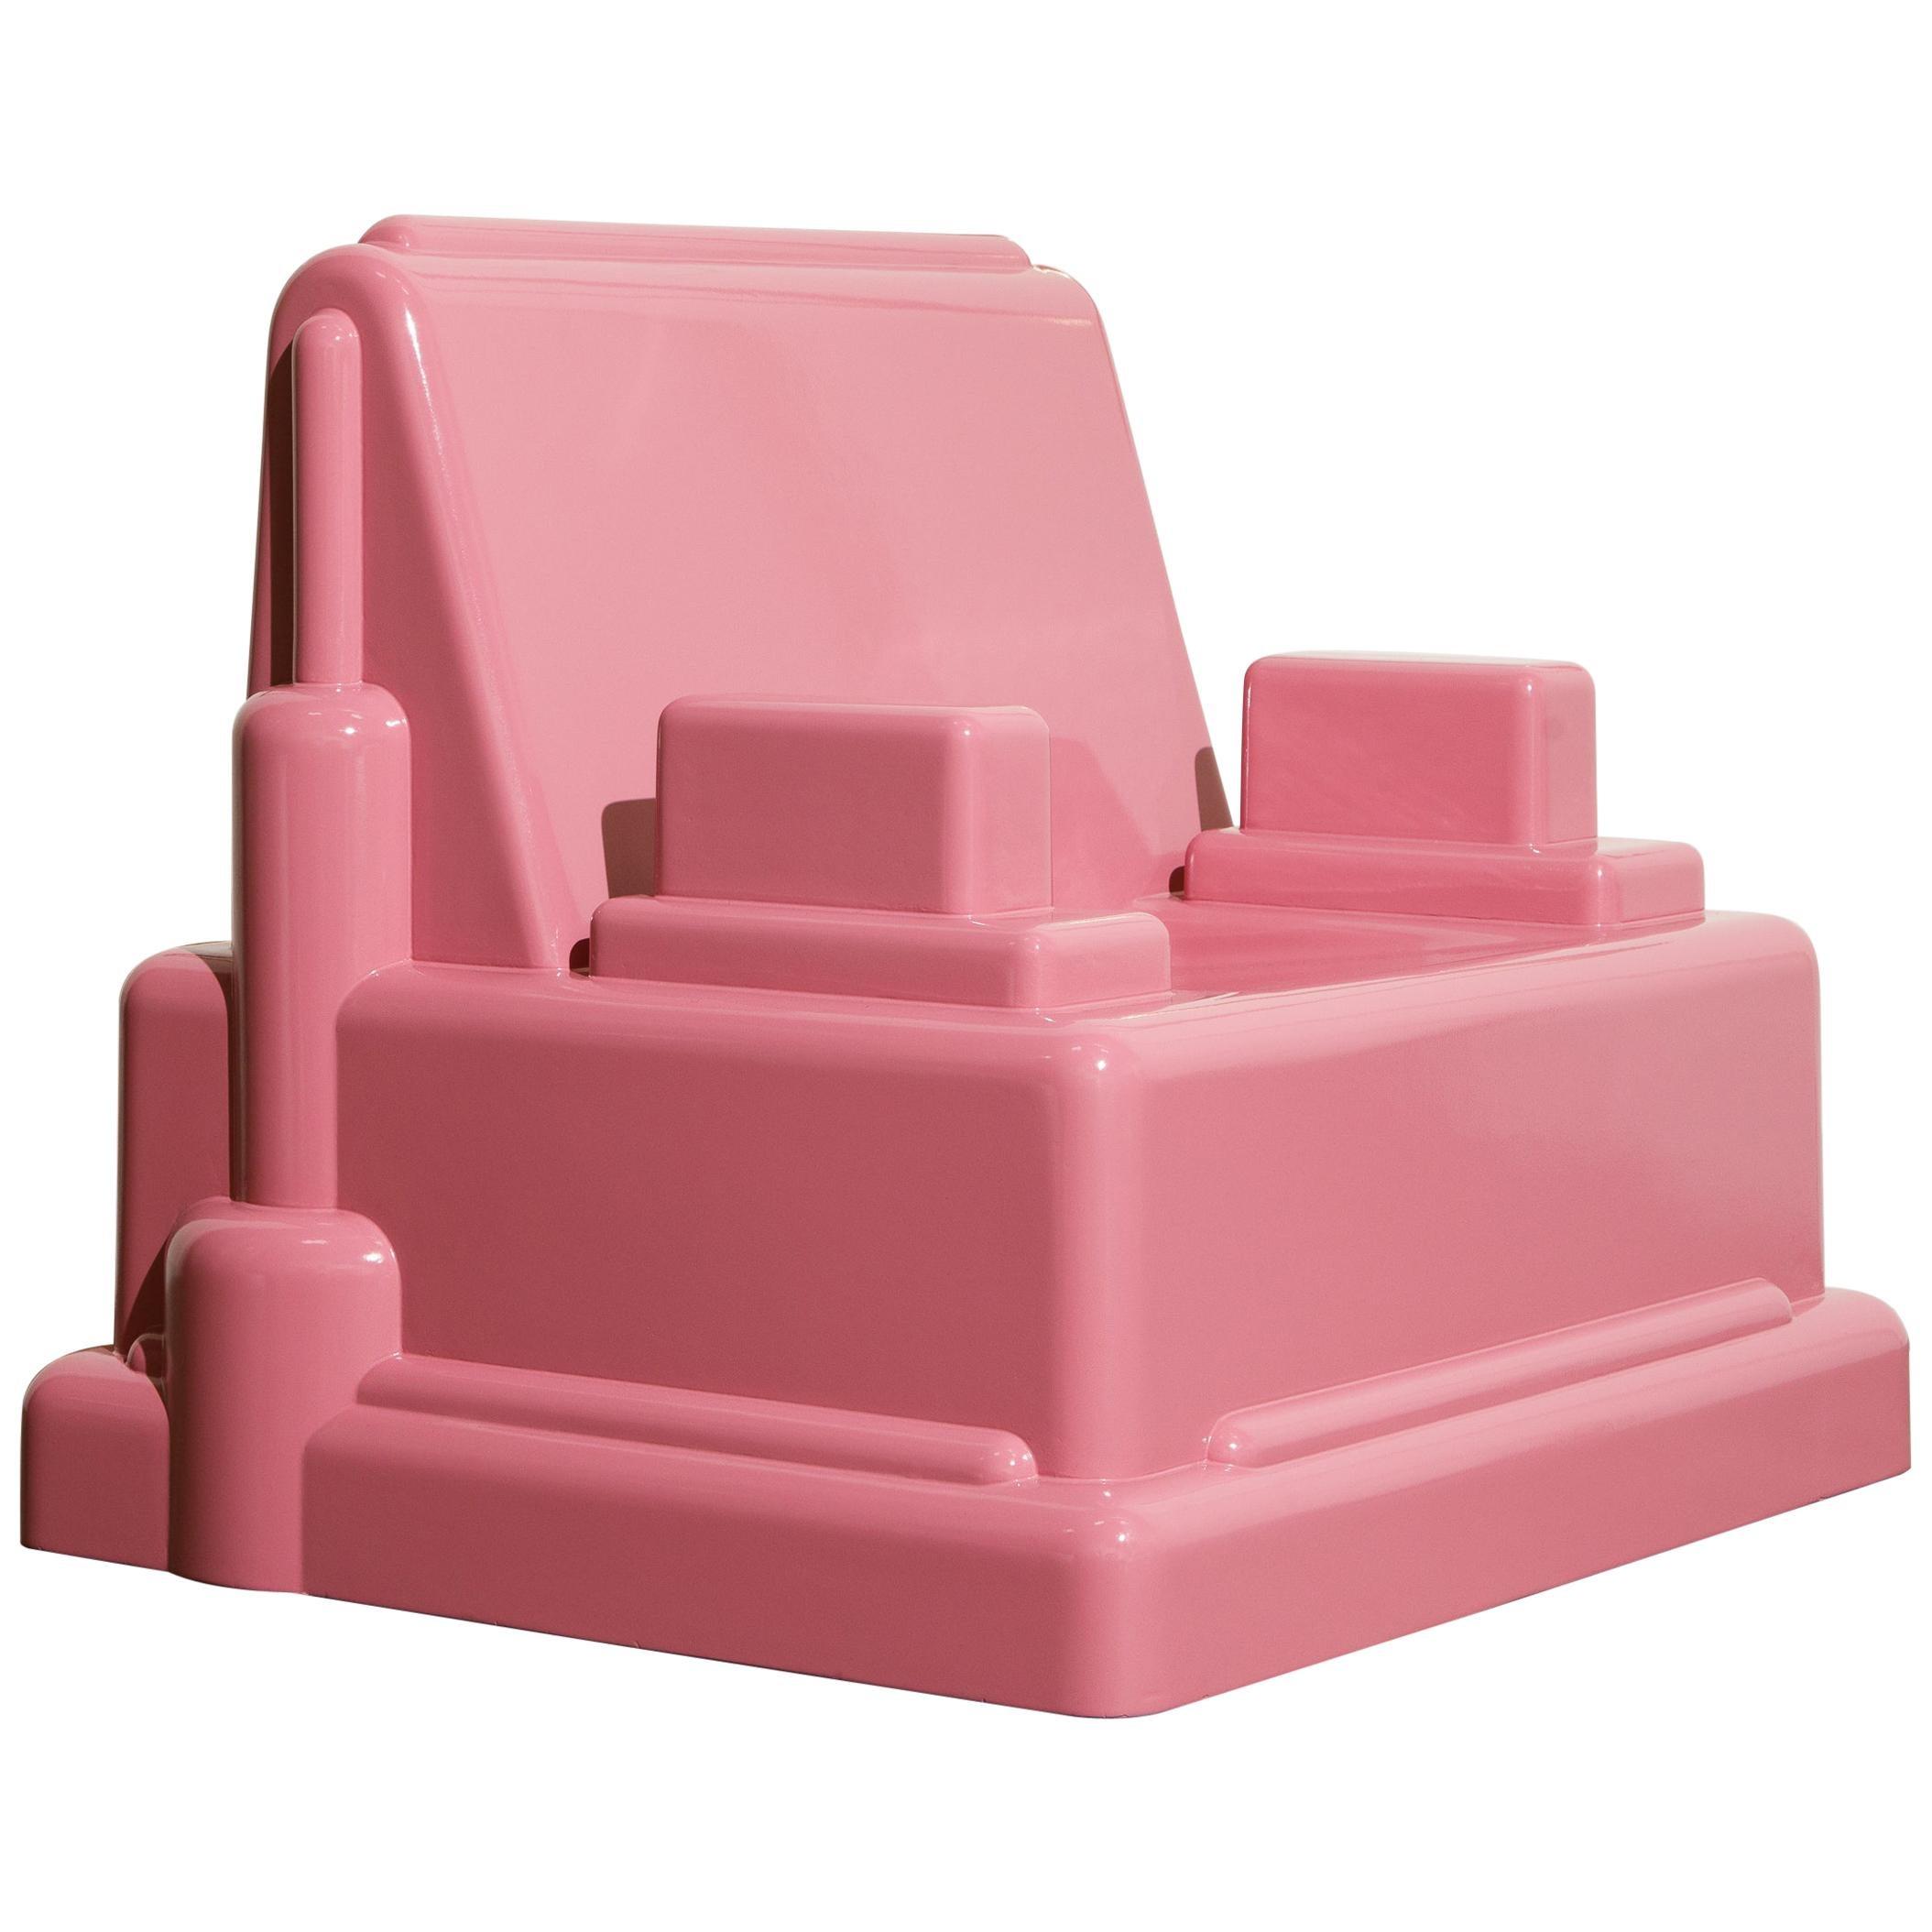 Marco Zanini 'Roma' Fiberglass Throne Chair for Memphis Milano, Italy, c. 1986